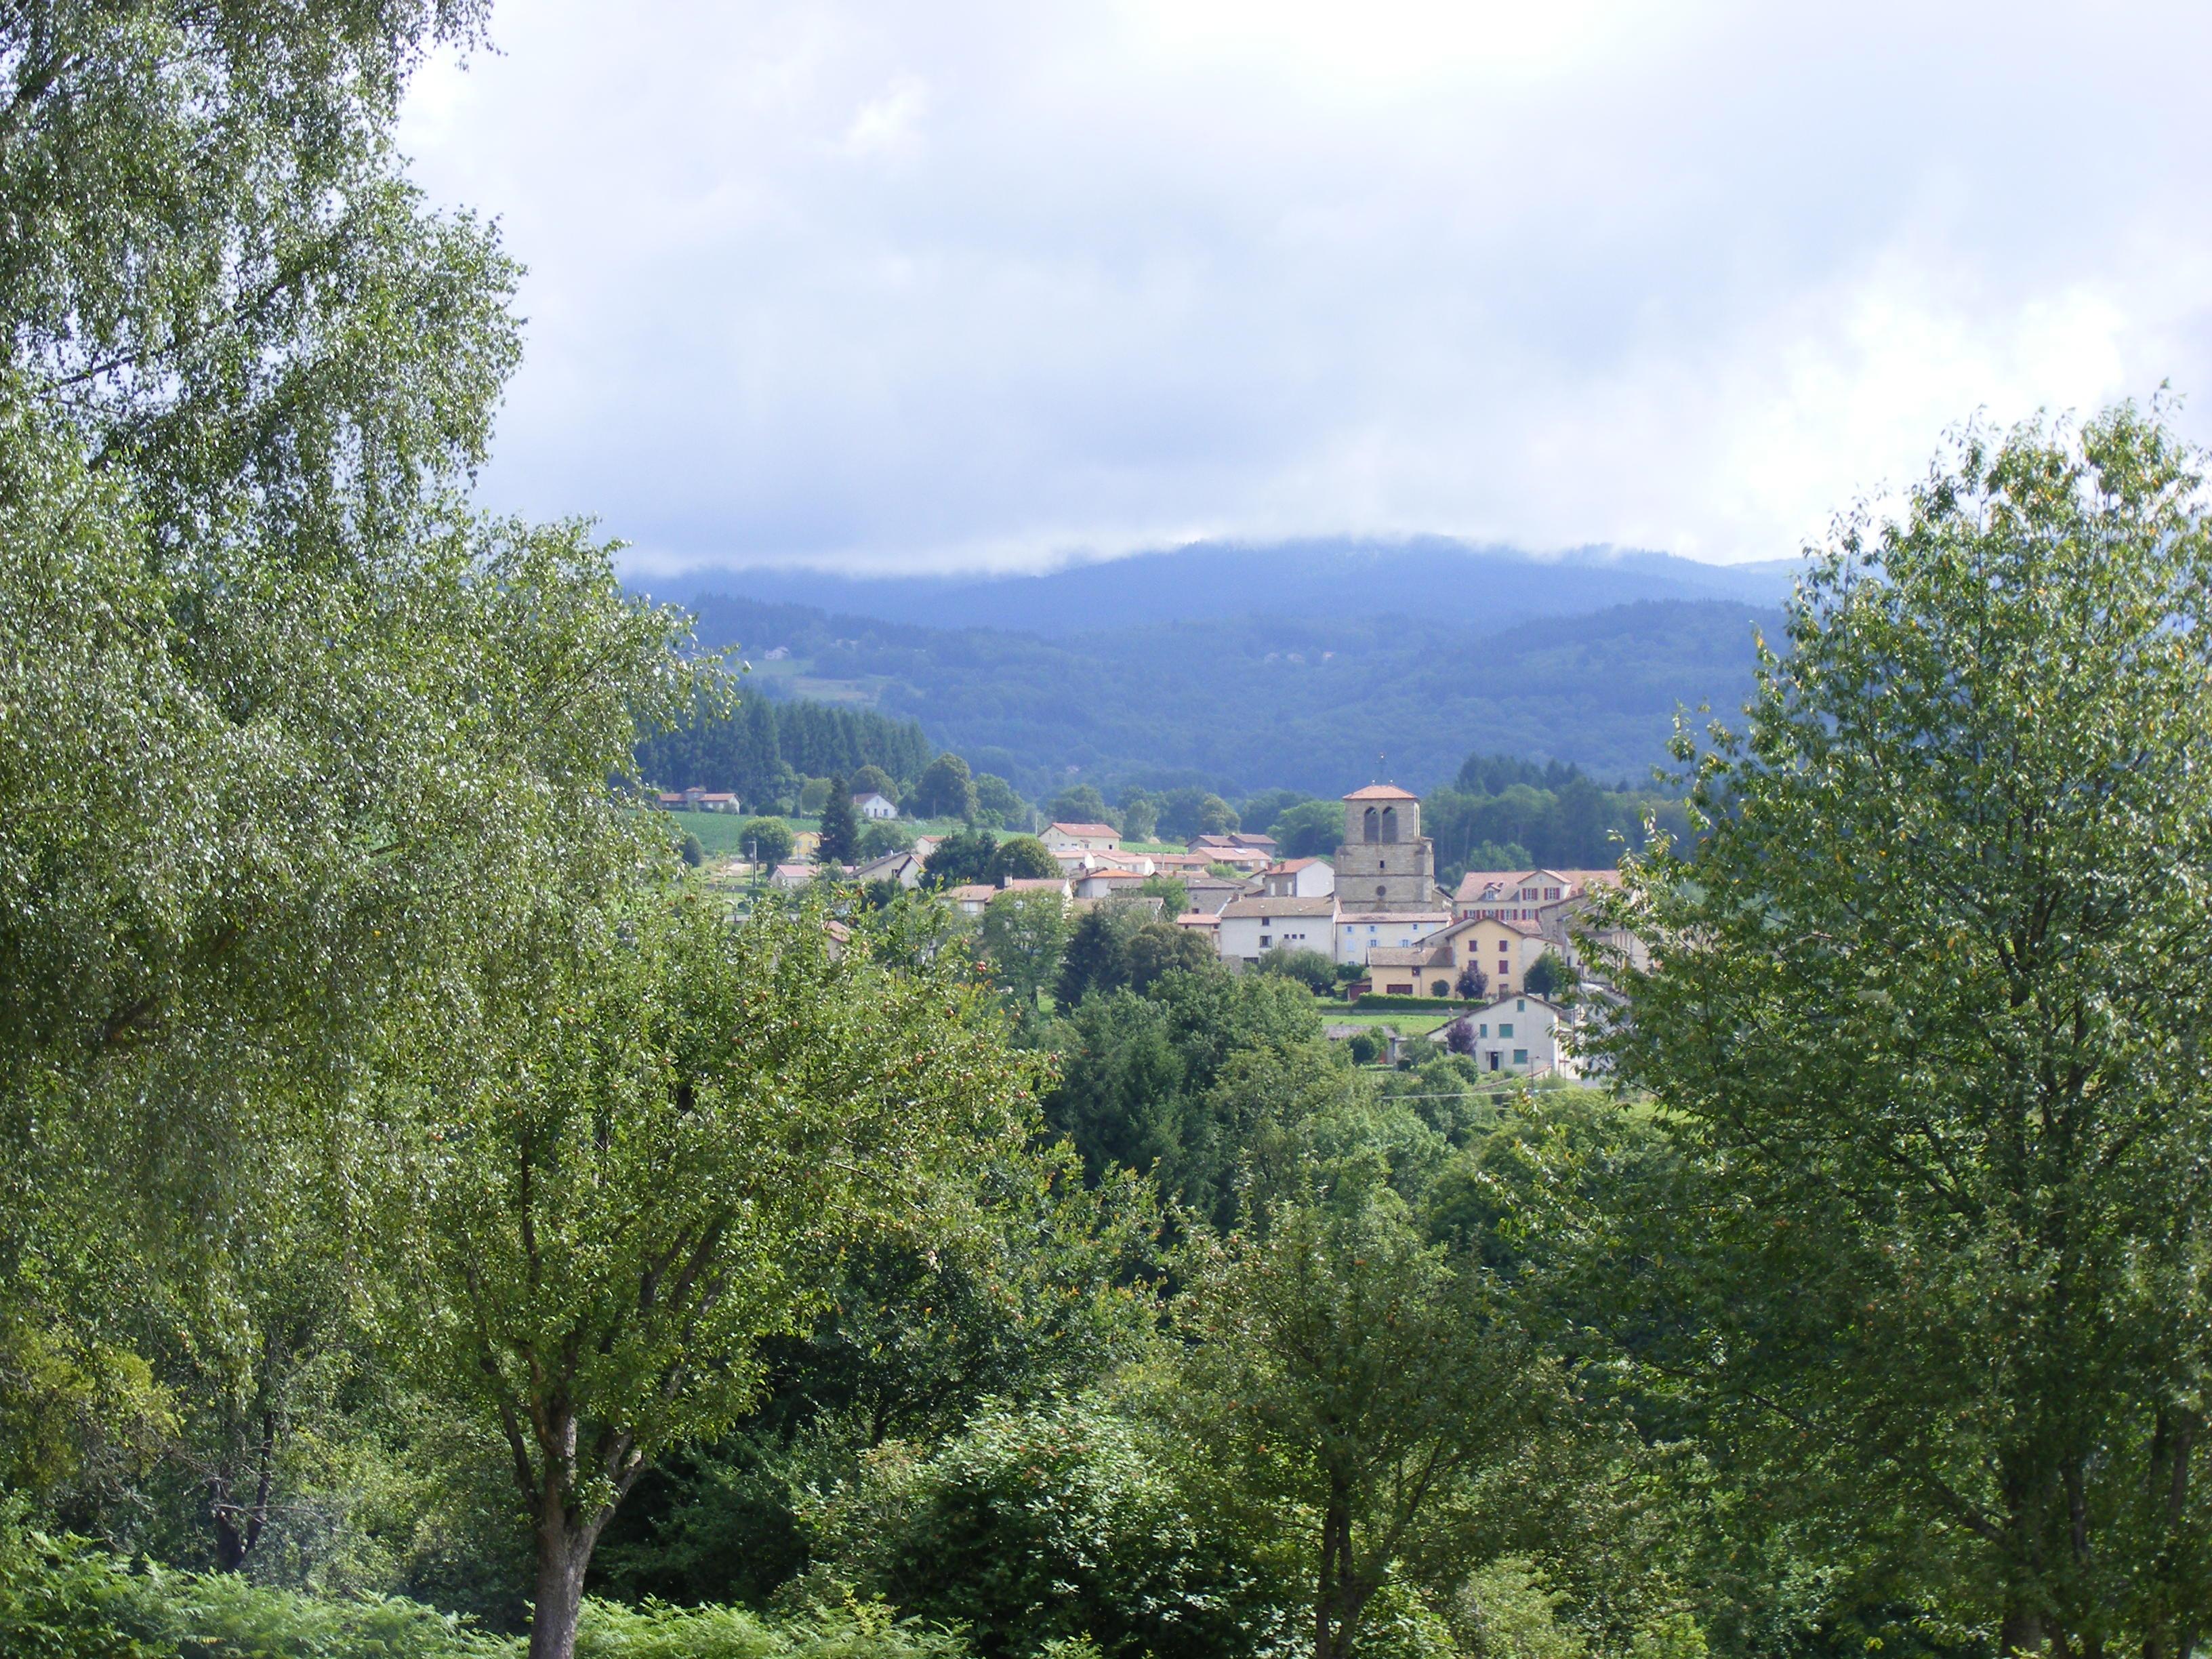 Marat, Puy-de-Dôme